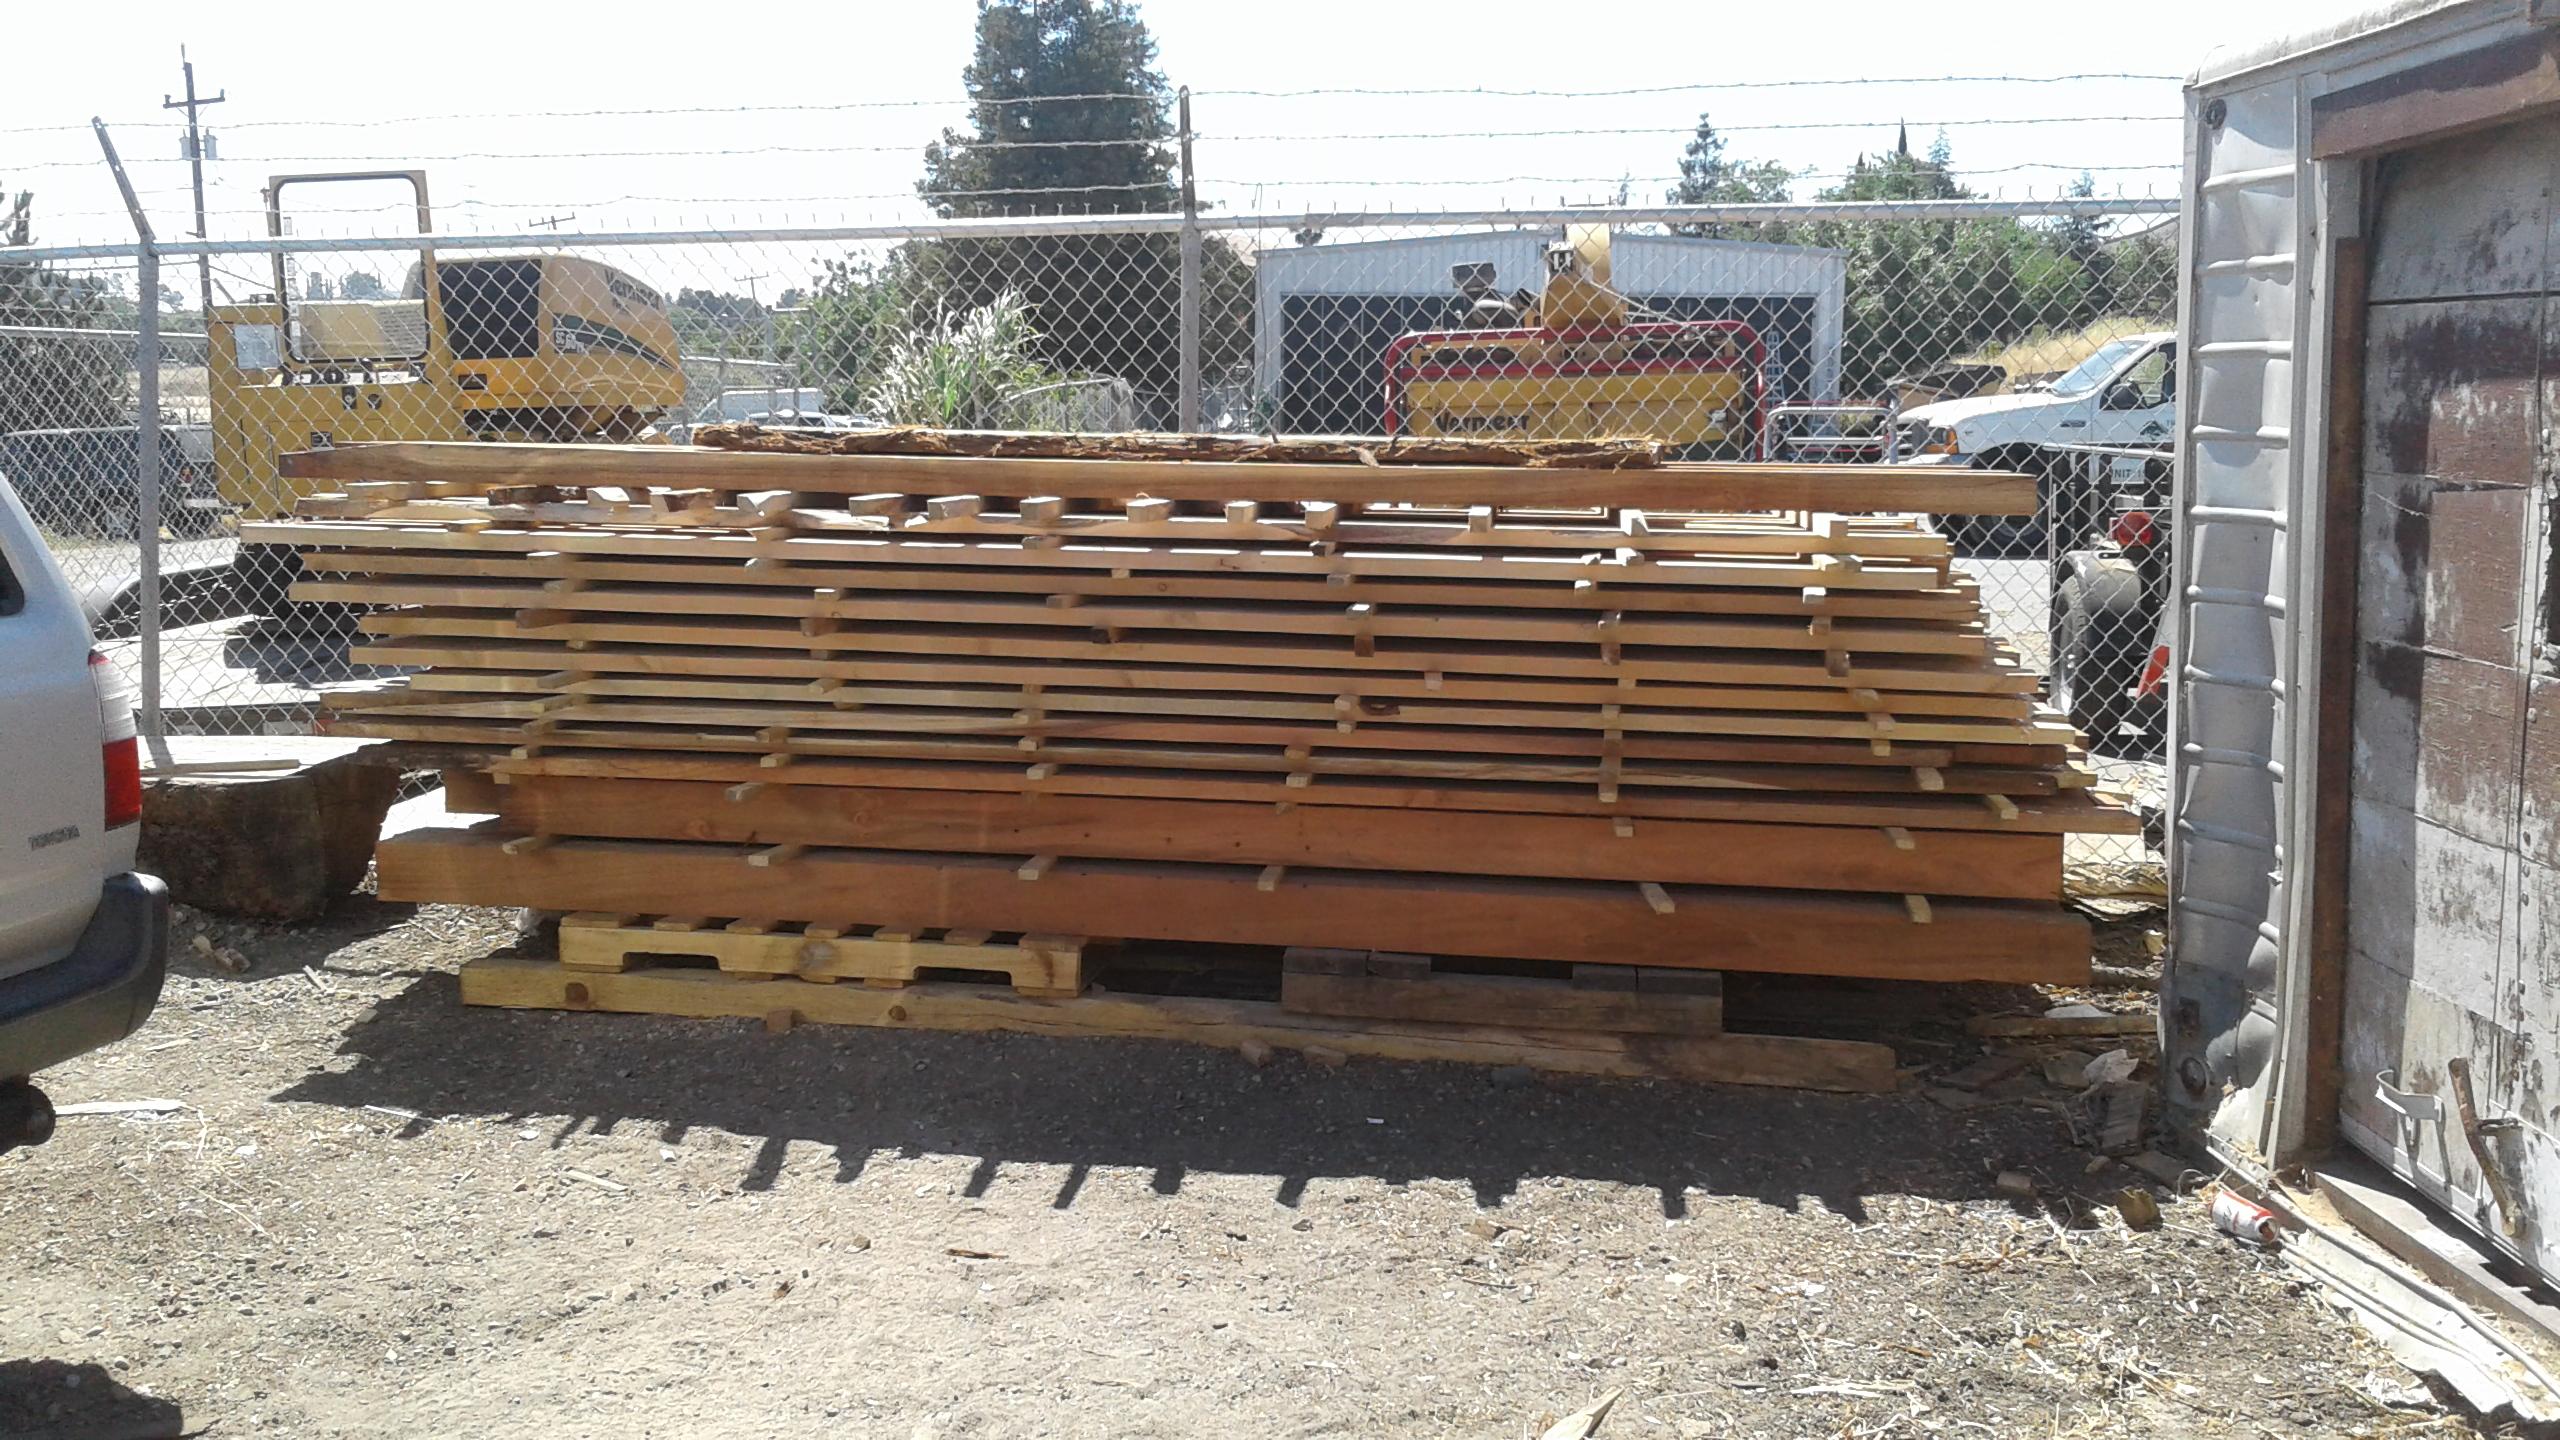 Urban Lumber Dimensional Lumber Traverso Tree Service Inc